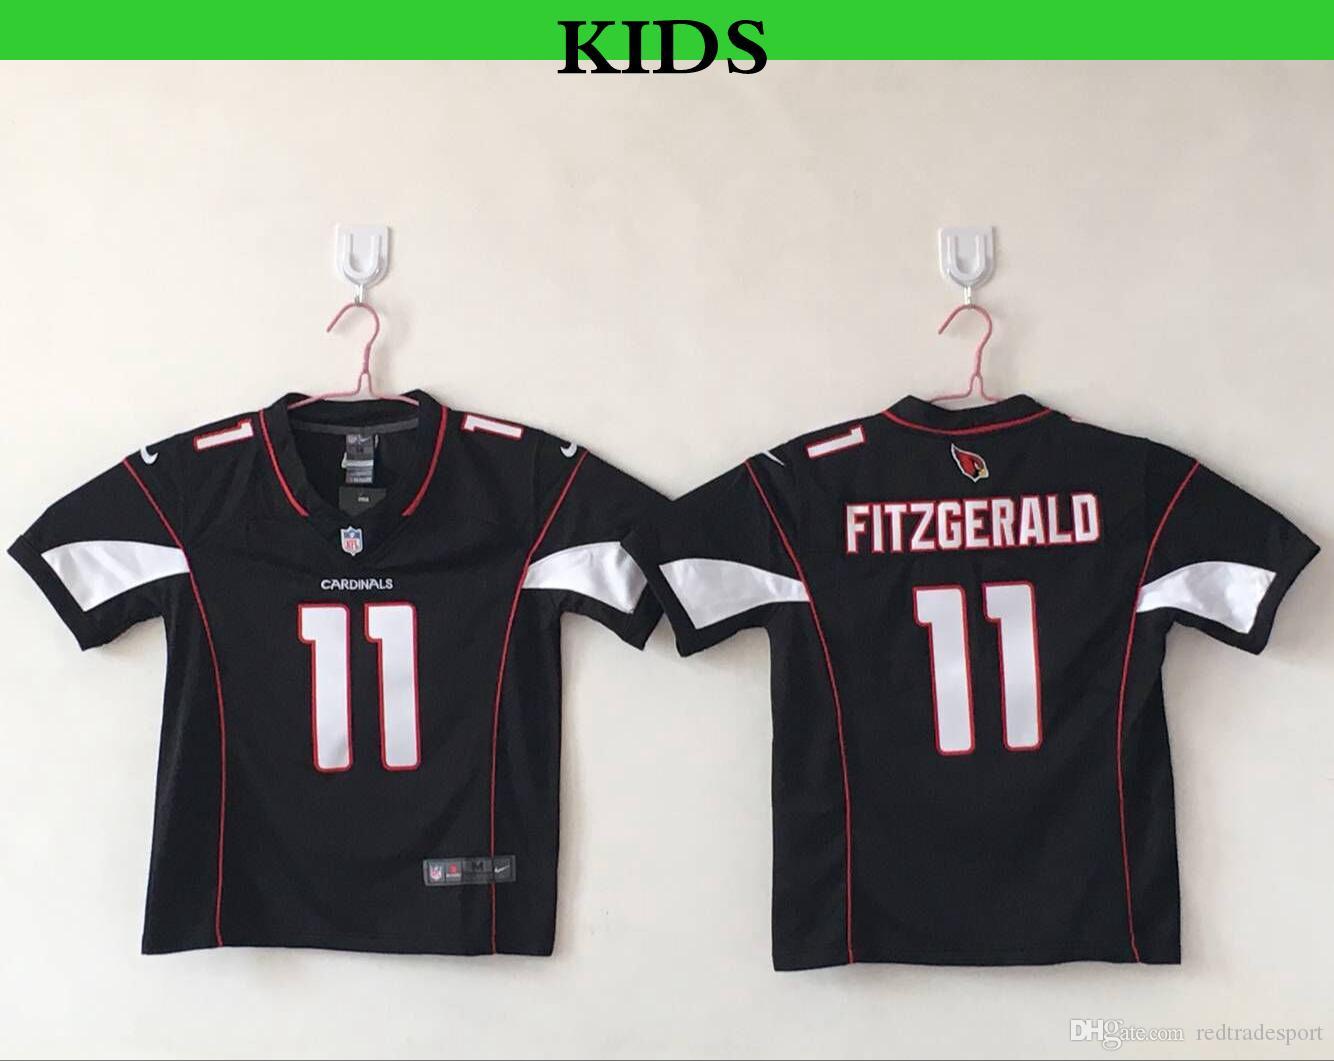 2554cf51 Youth Arizona Kids Cardinals Larry Fitzgerald Football Jerseys Cheap Black  Red Larry Fitzgerald 11 Stitched Football Shirts